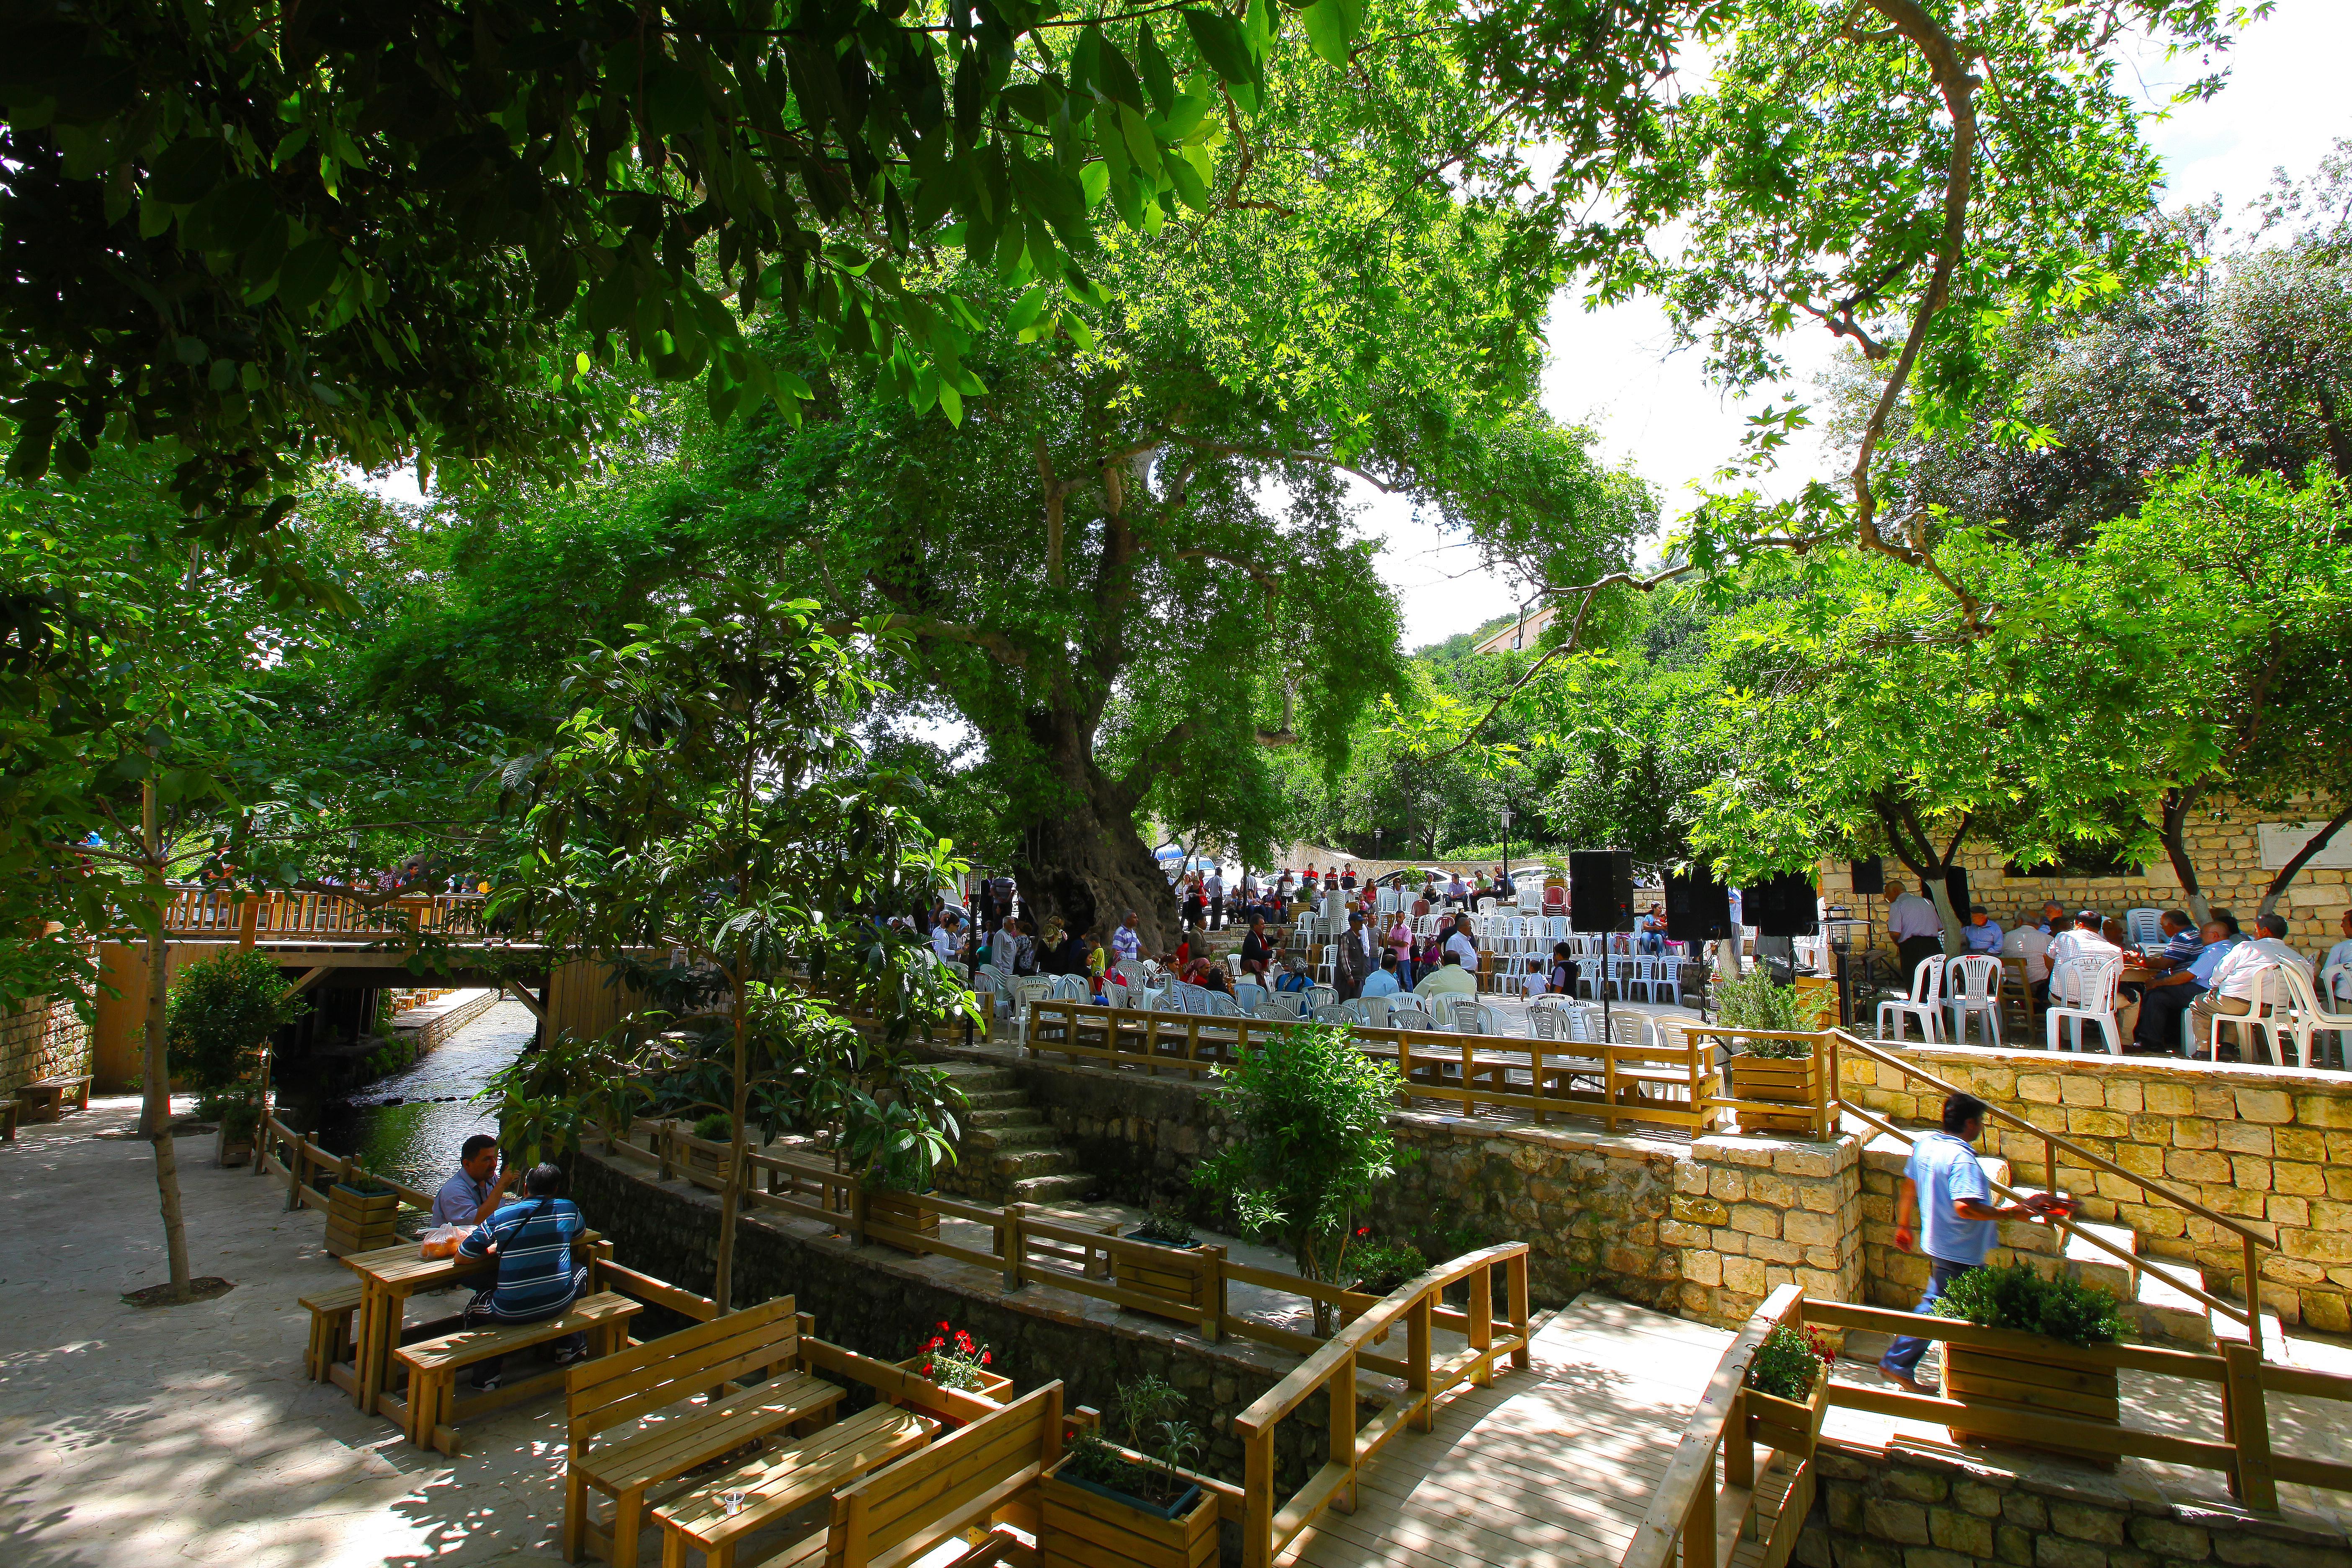 Dogal Kulturel Ve Tarihi Turizm Degerler